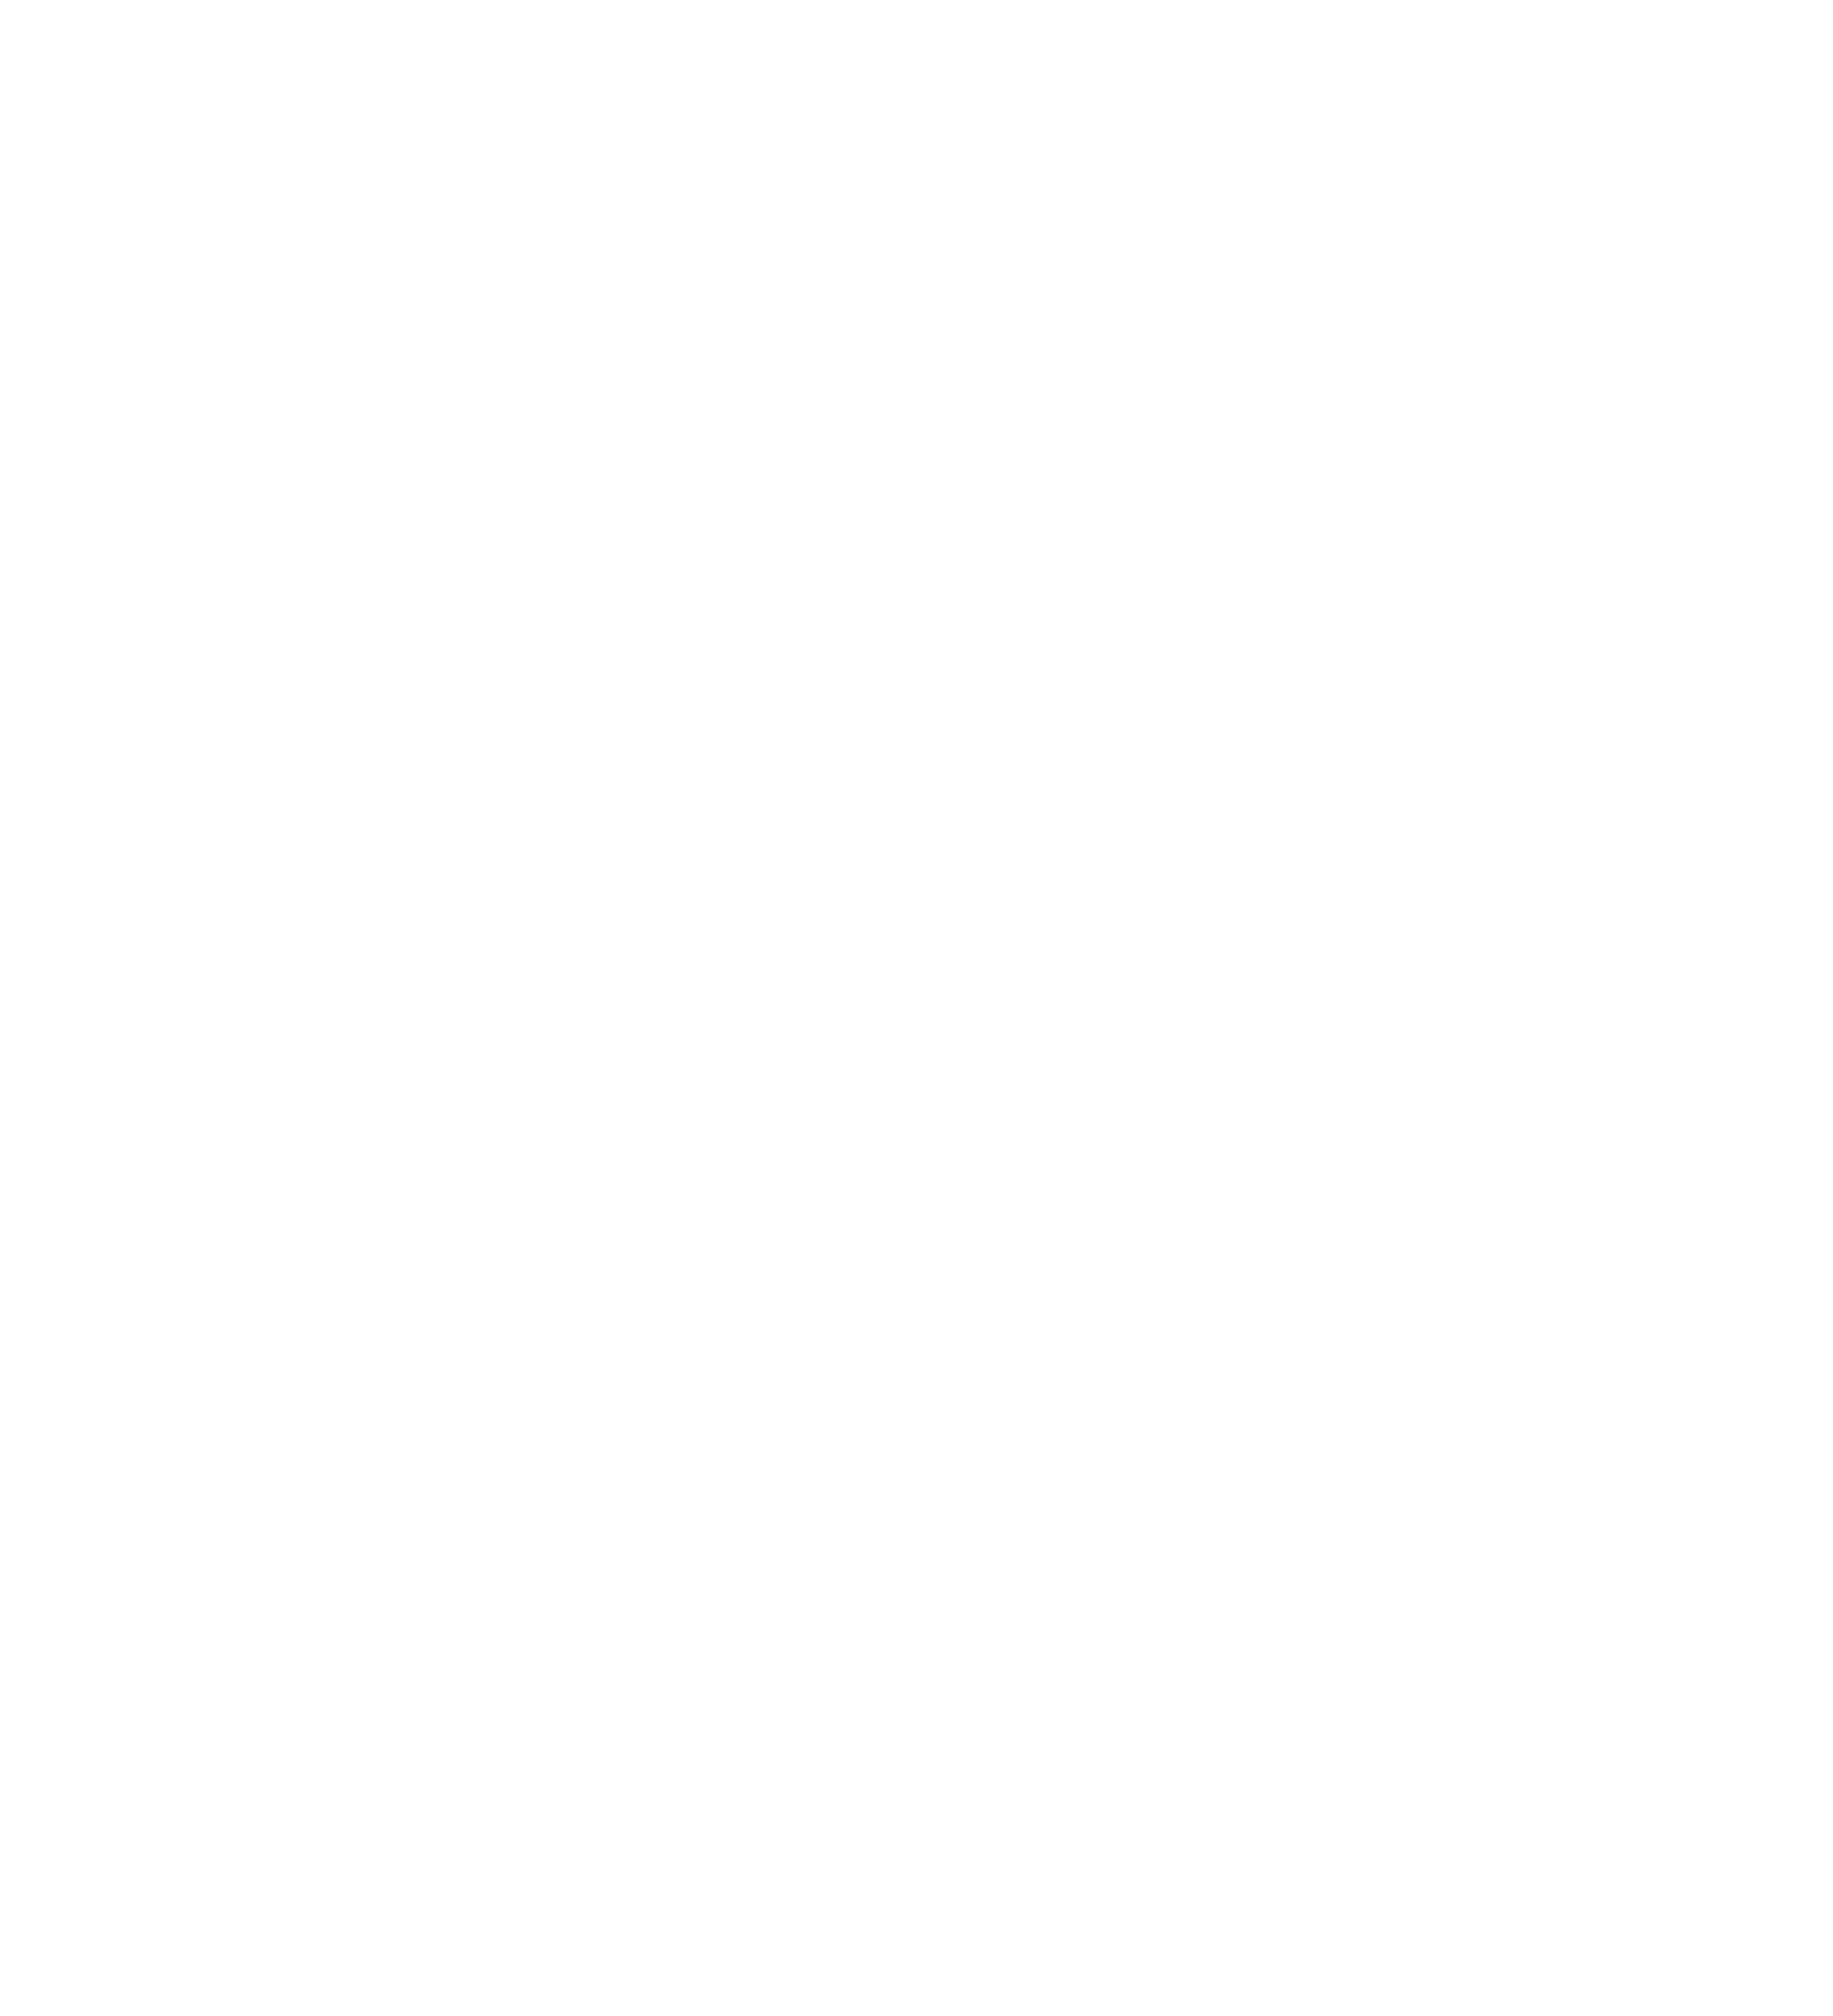 Paralaksa tła